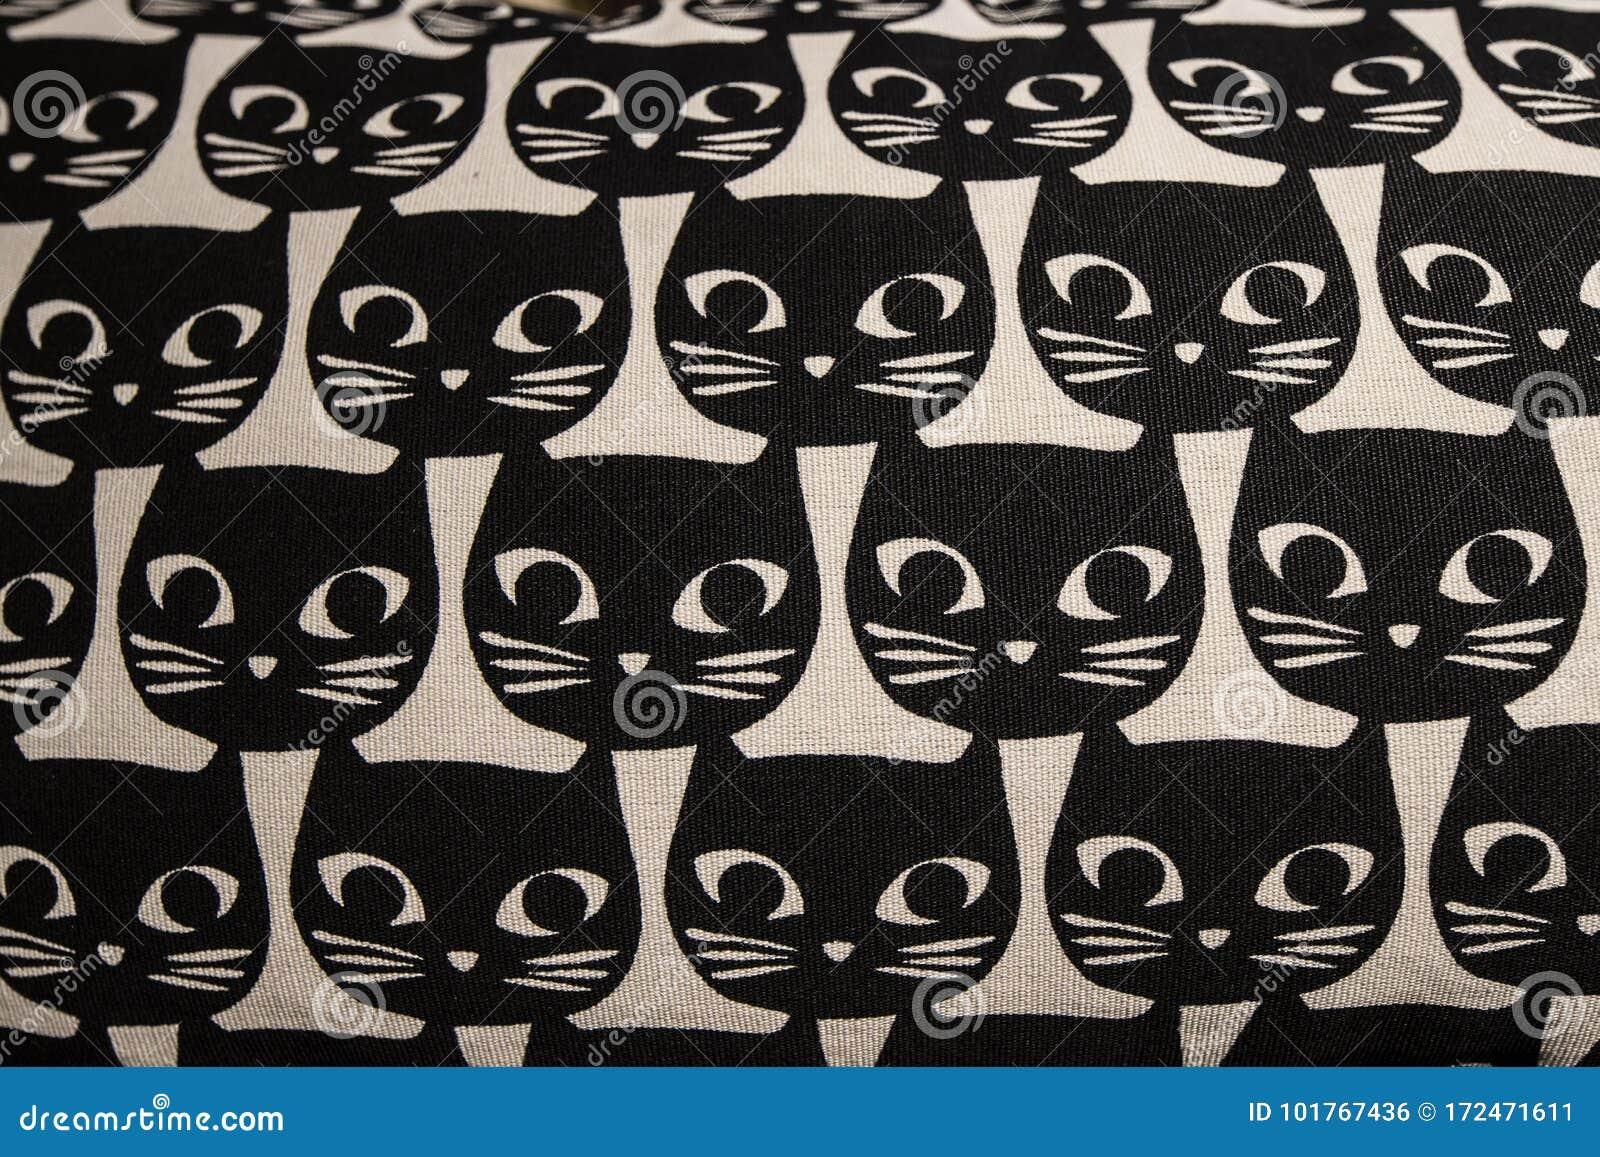 Cat head cartoon pattern